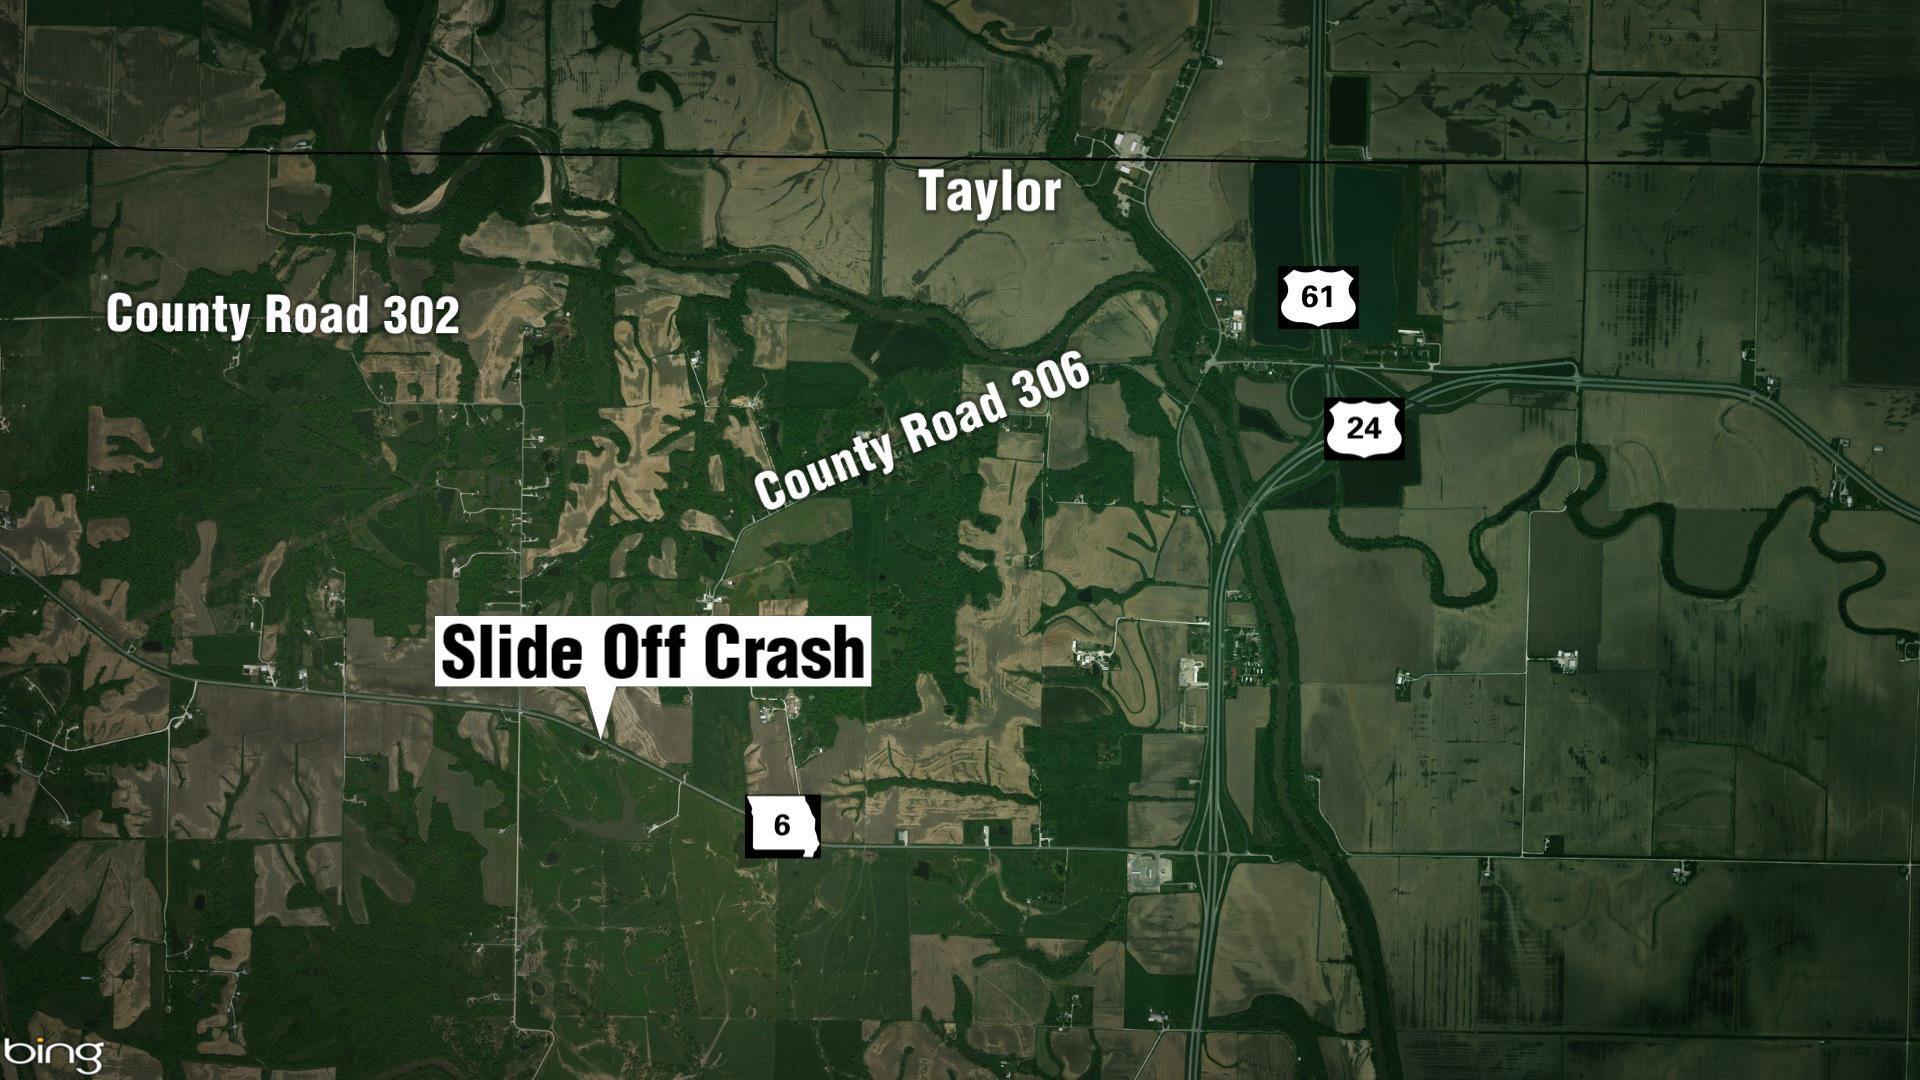 Location of crash site on Highway 6 in Missouri.